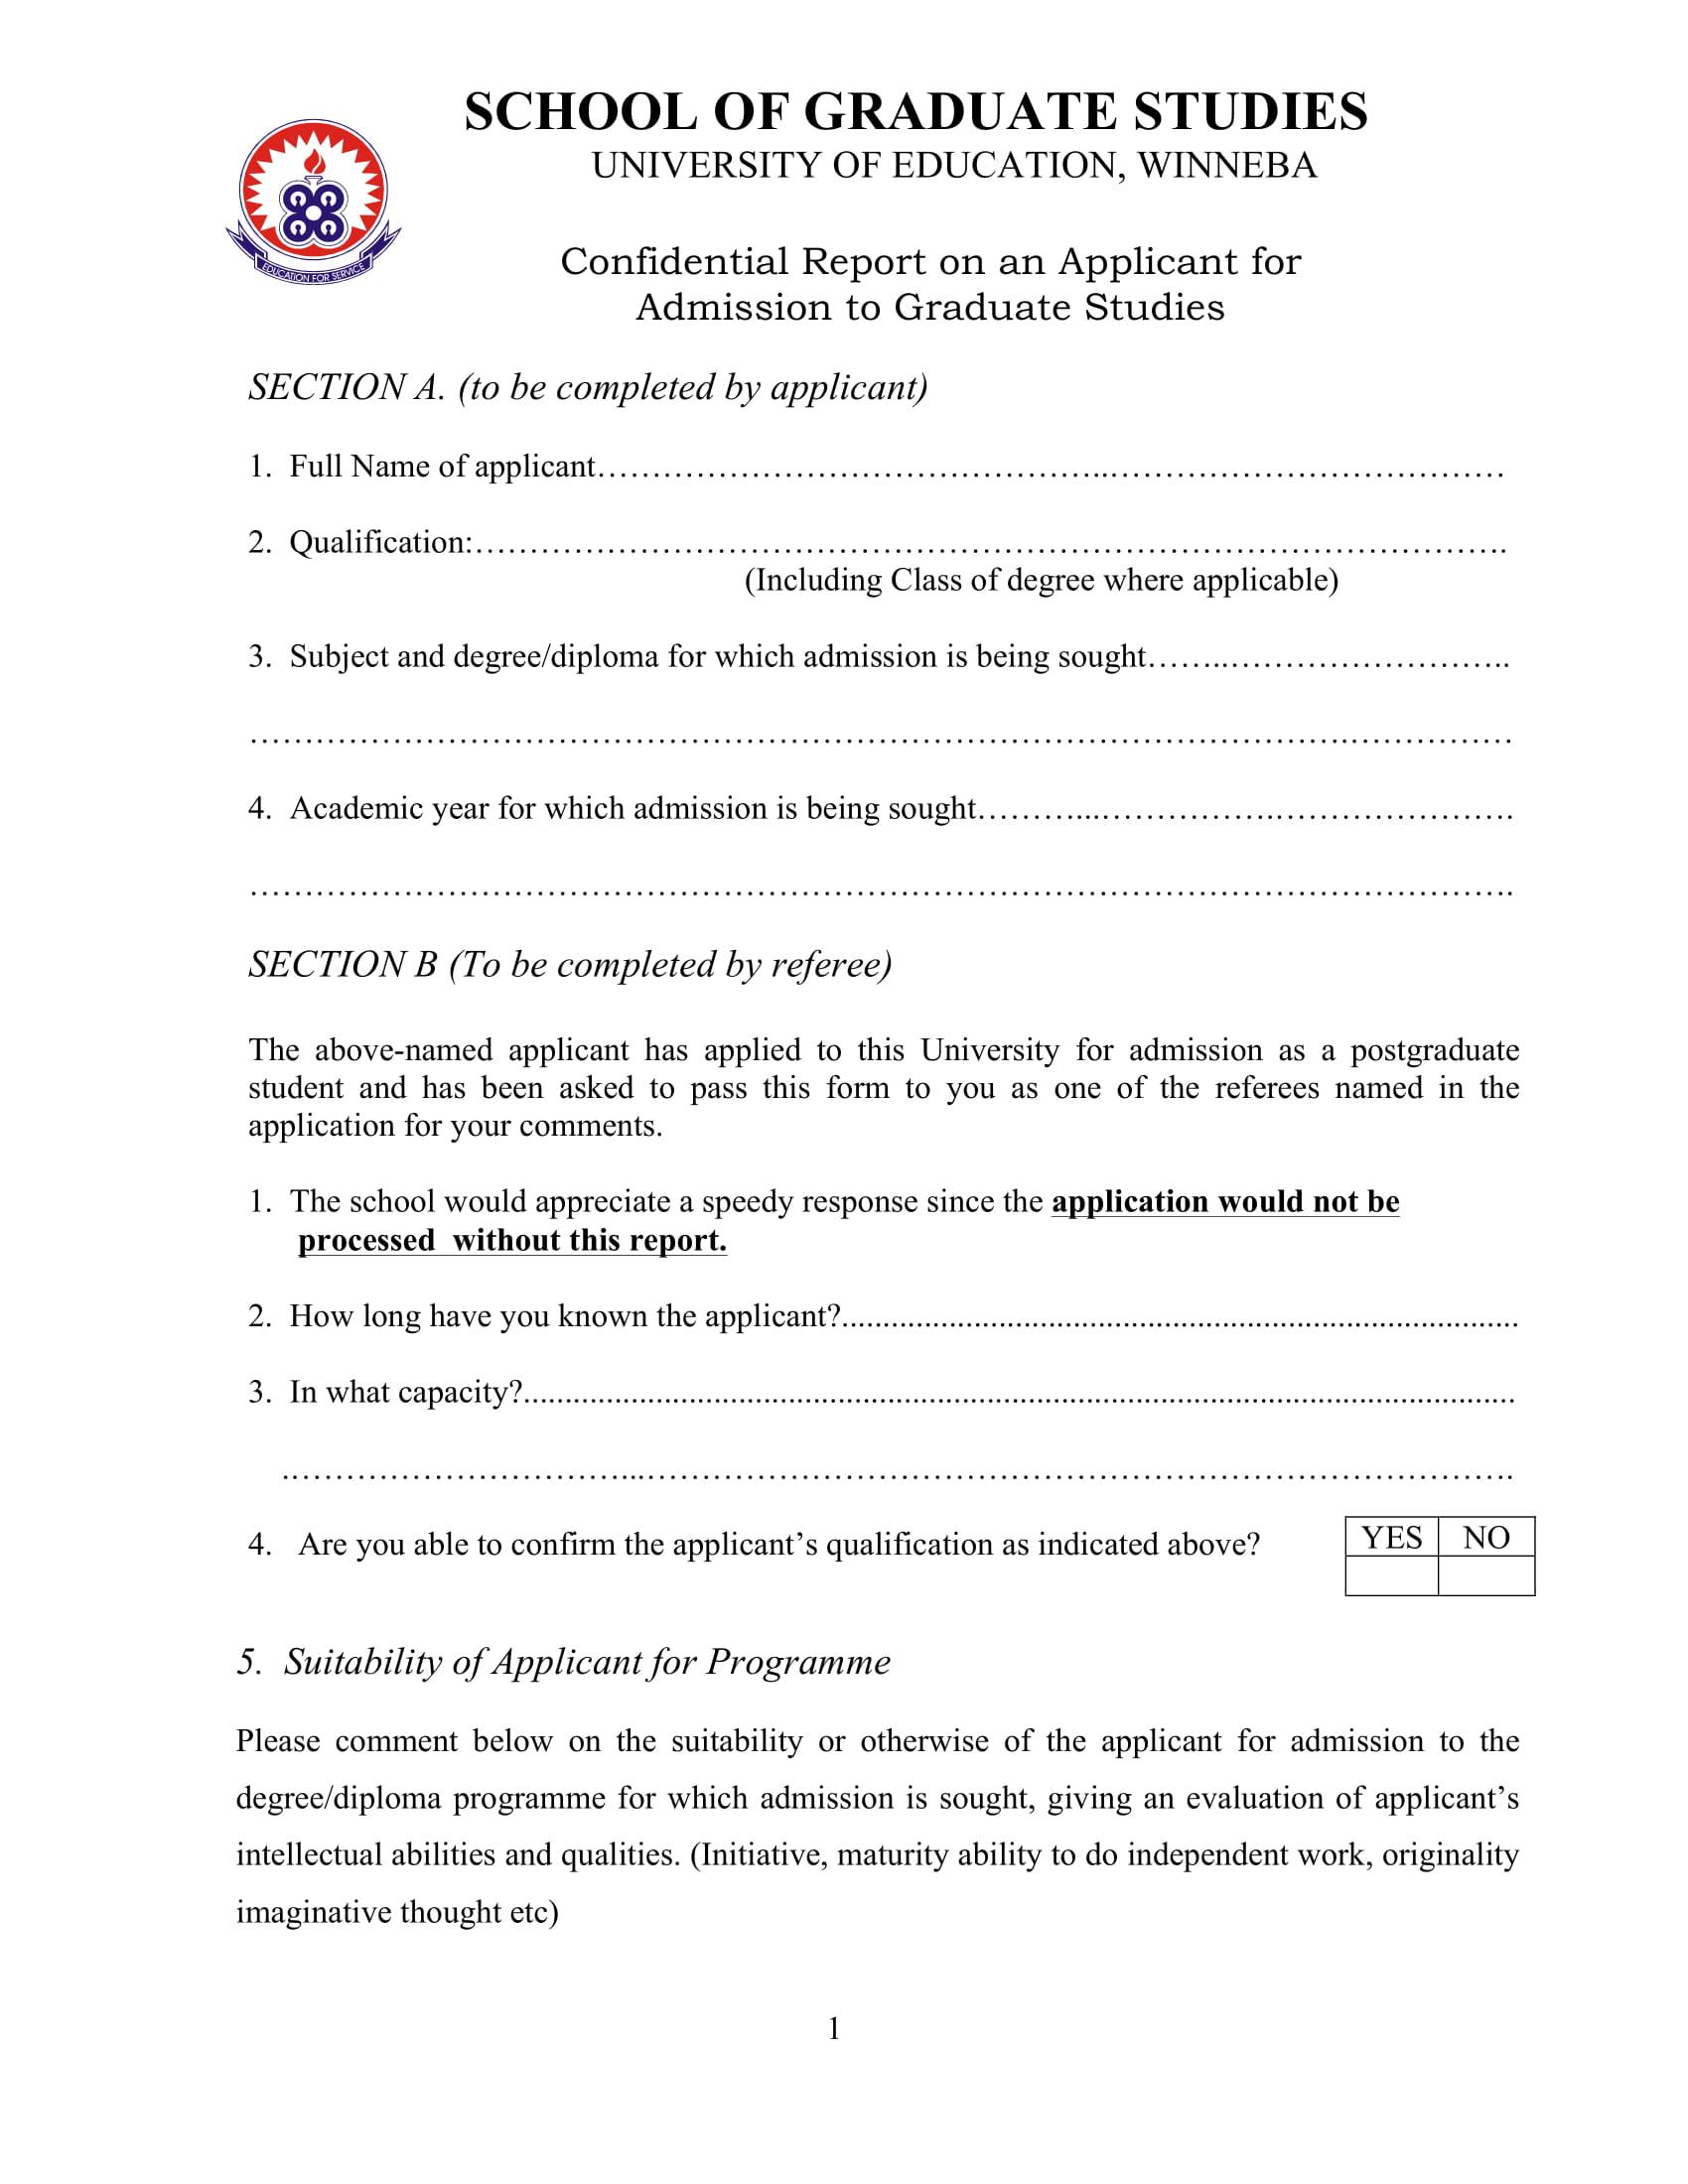 referee report for graduate applicants 1